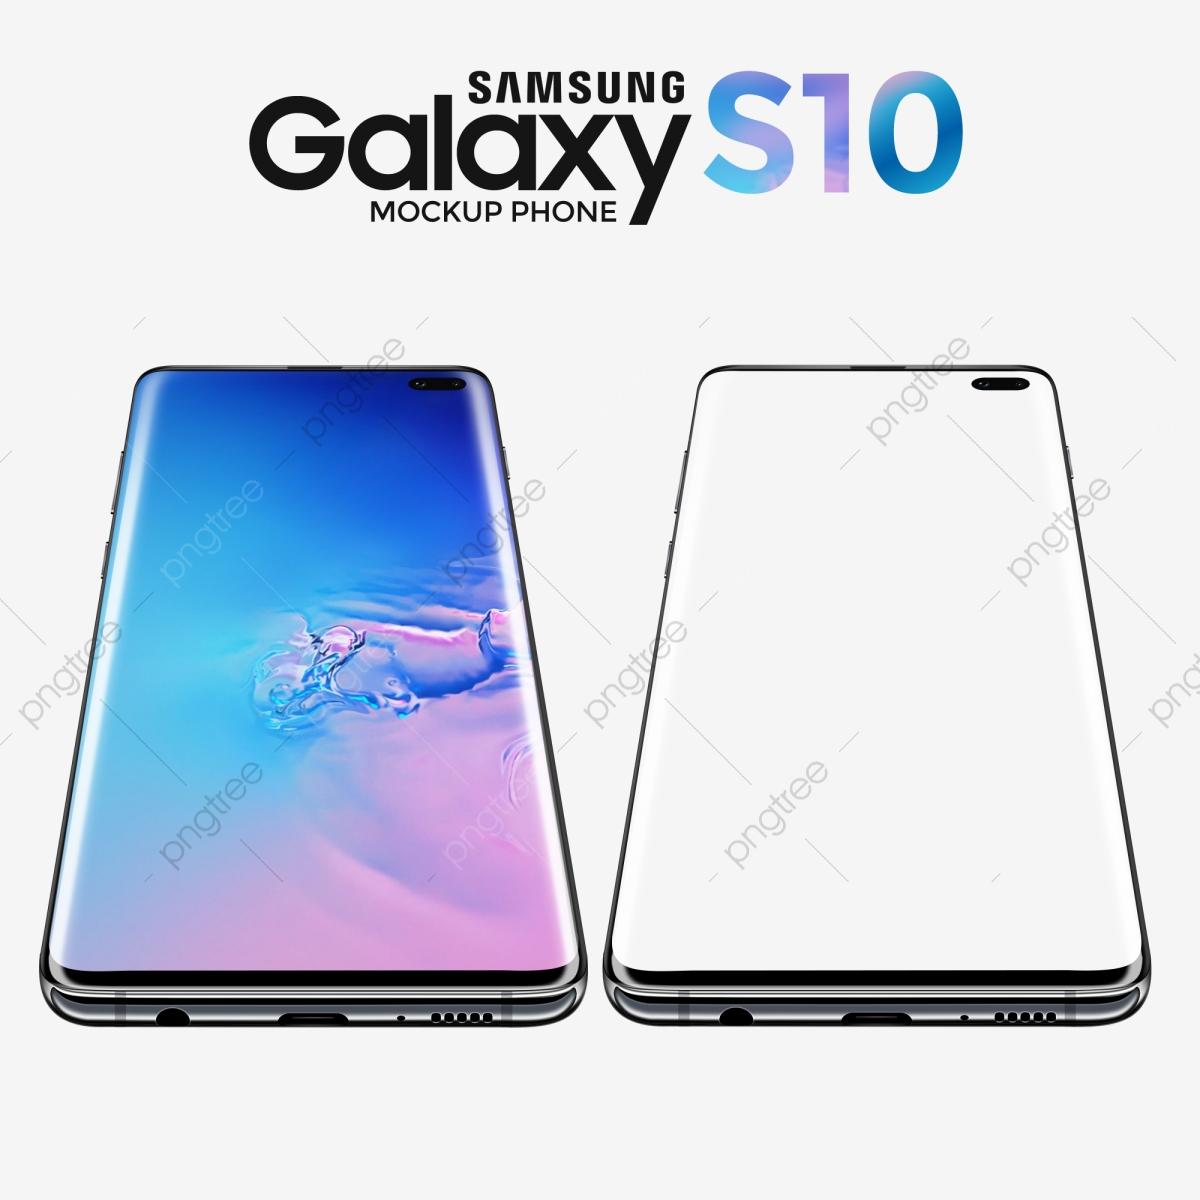 Mockup Samsung Galaxy S10 Perspective Version, Phone.